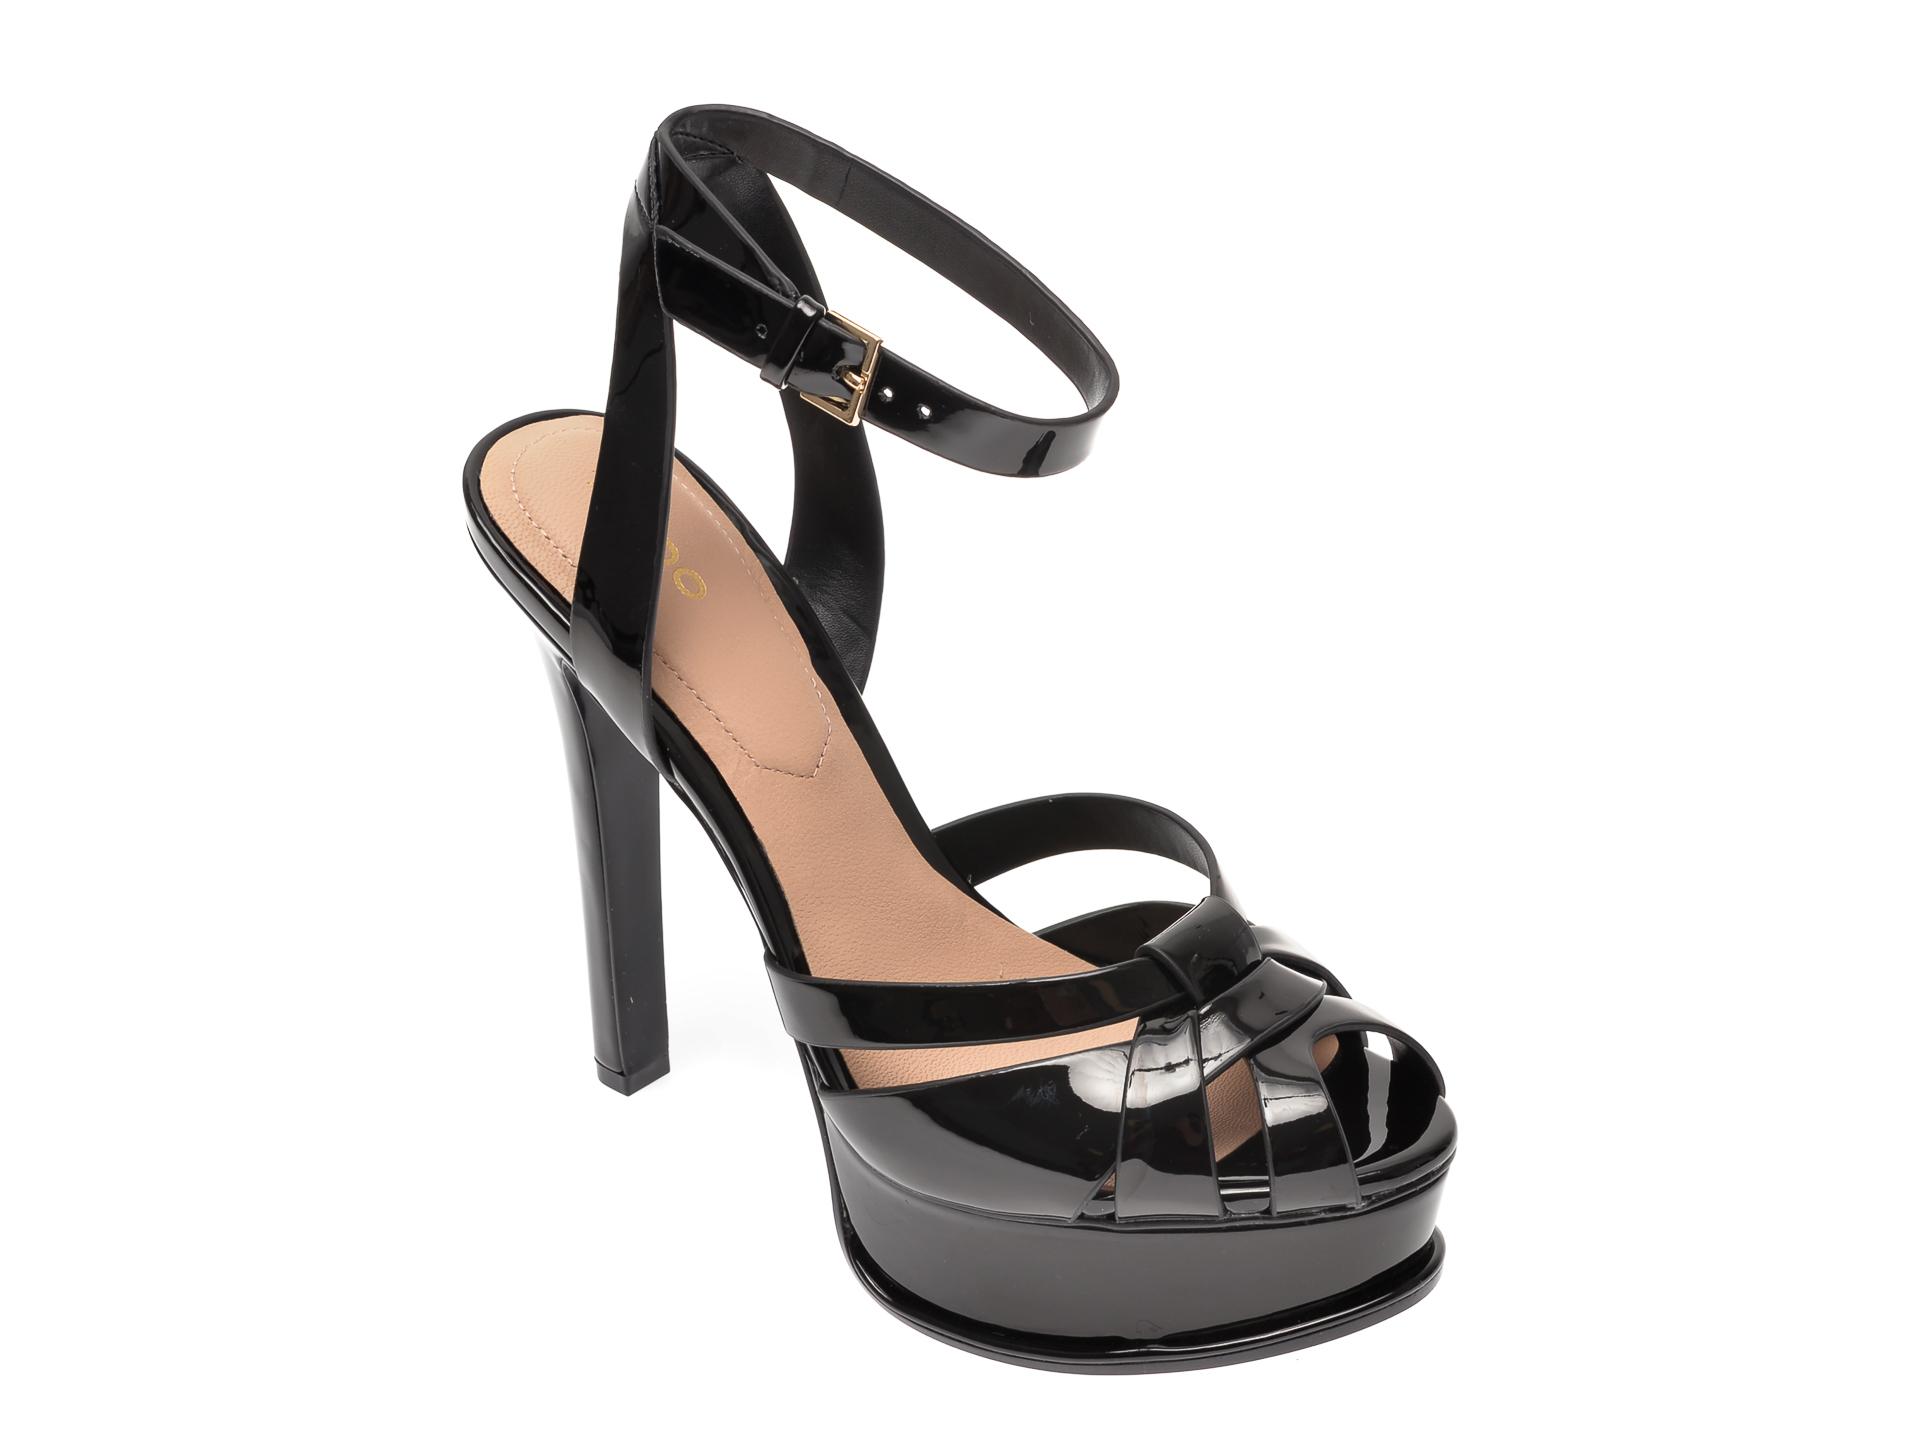 Sandale ALDO negre, Lacla001, din piele ecologica imagine otter.ro 2021